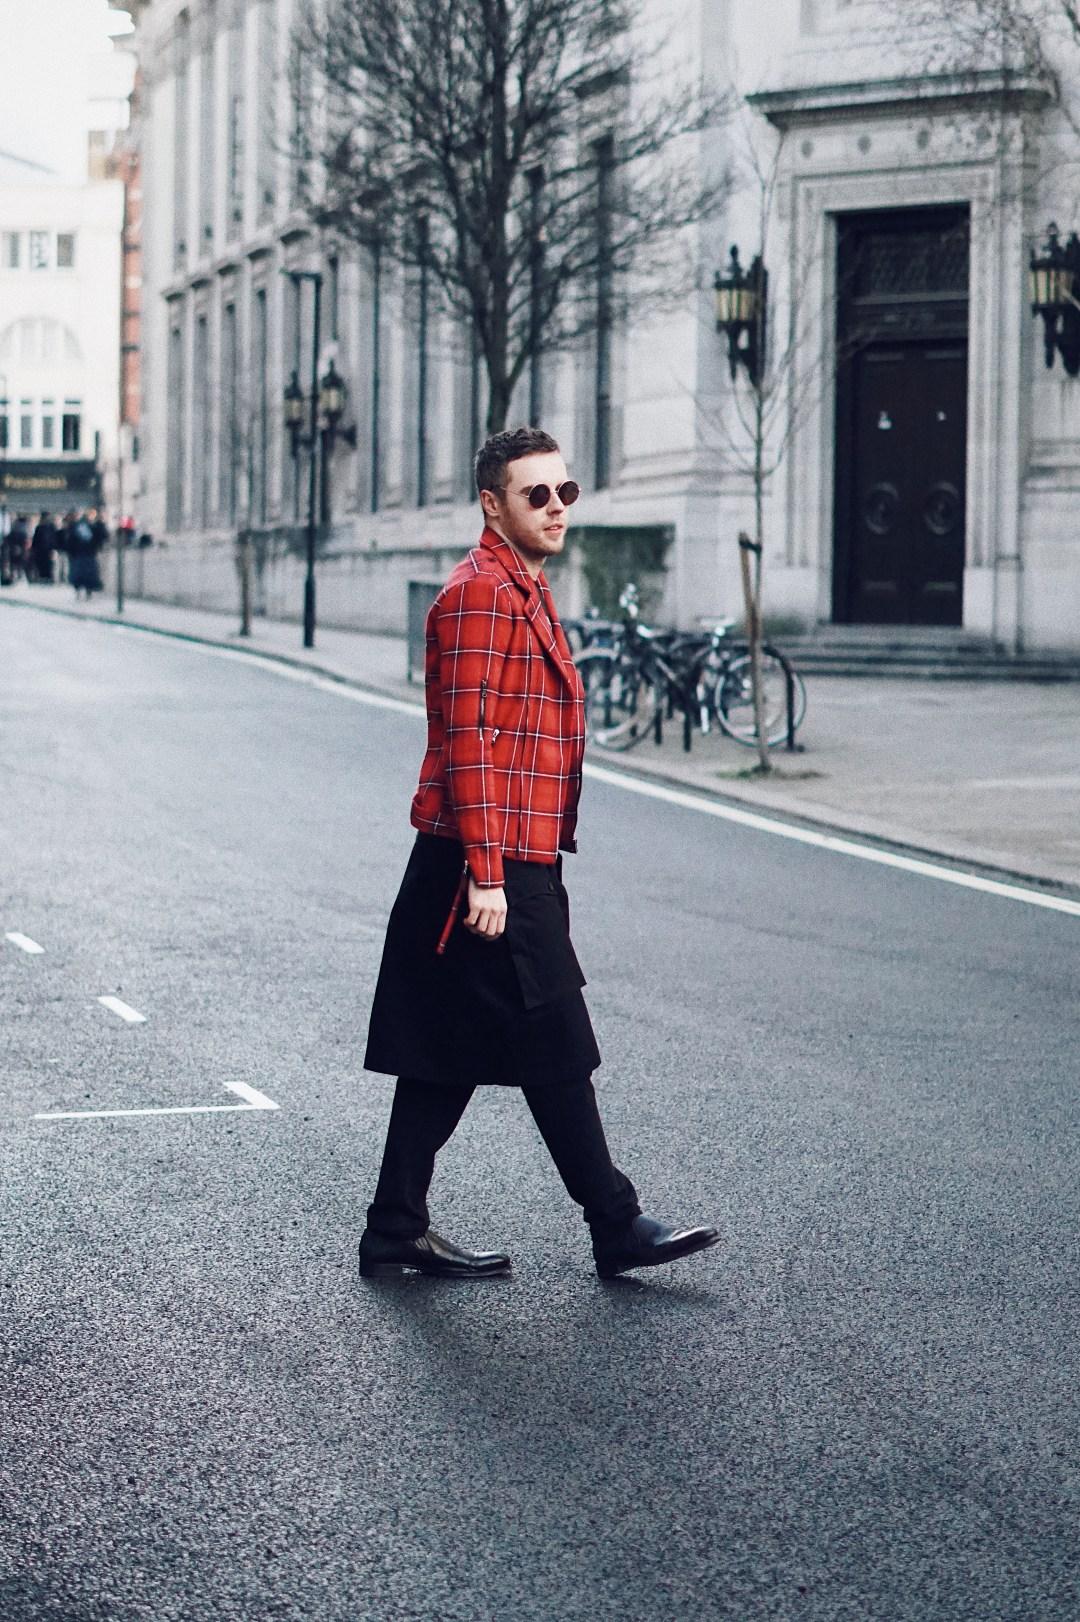 London Fashion Week. Wearing Sixth June Tartan Biker Jacket, ASOS Skinny Trousers With Wrap Button Up Skirt In Black and Zara Shoes.